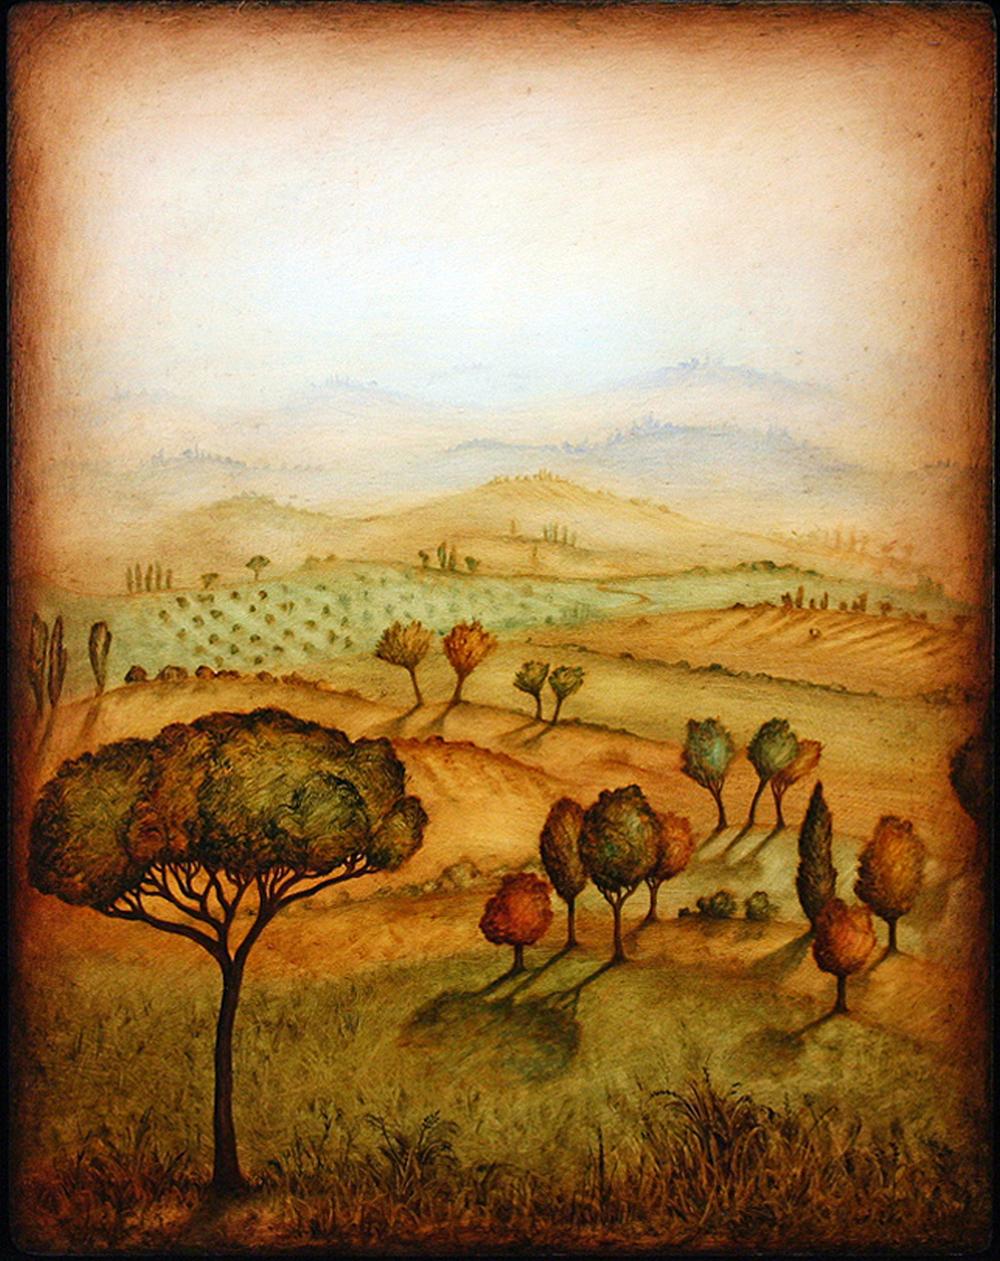 720-Vista Toscana.jpg